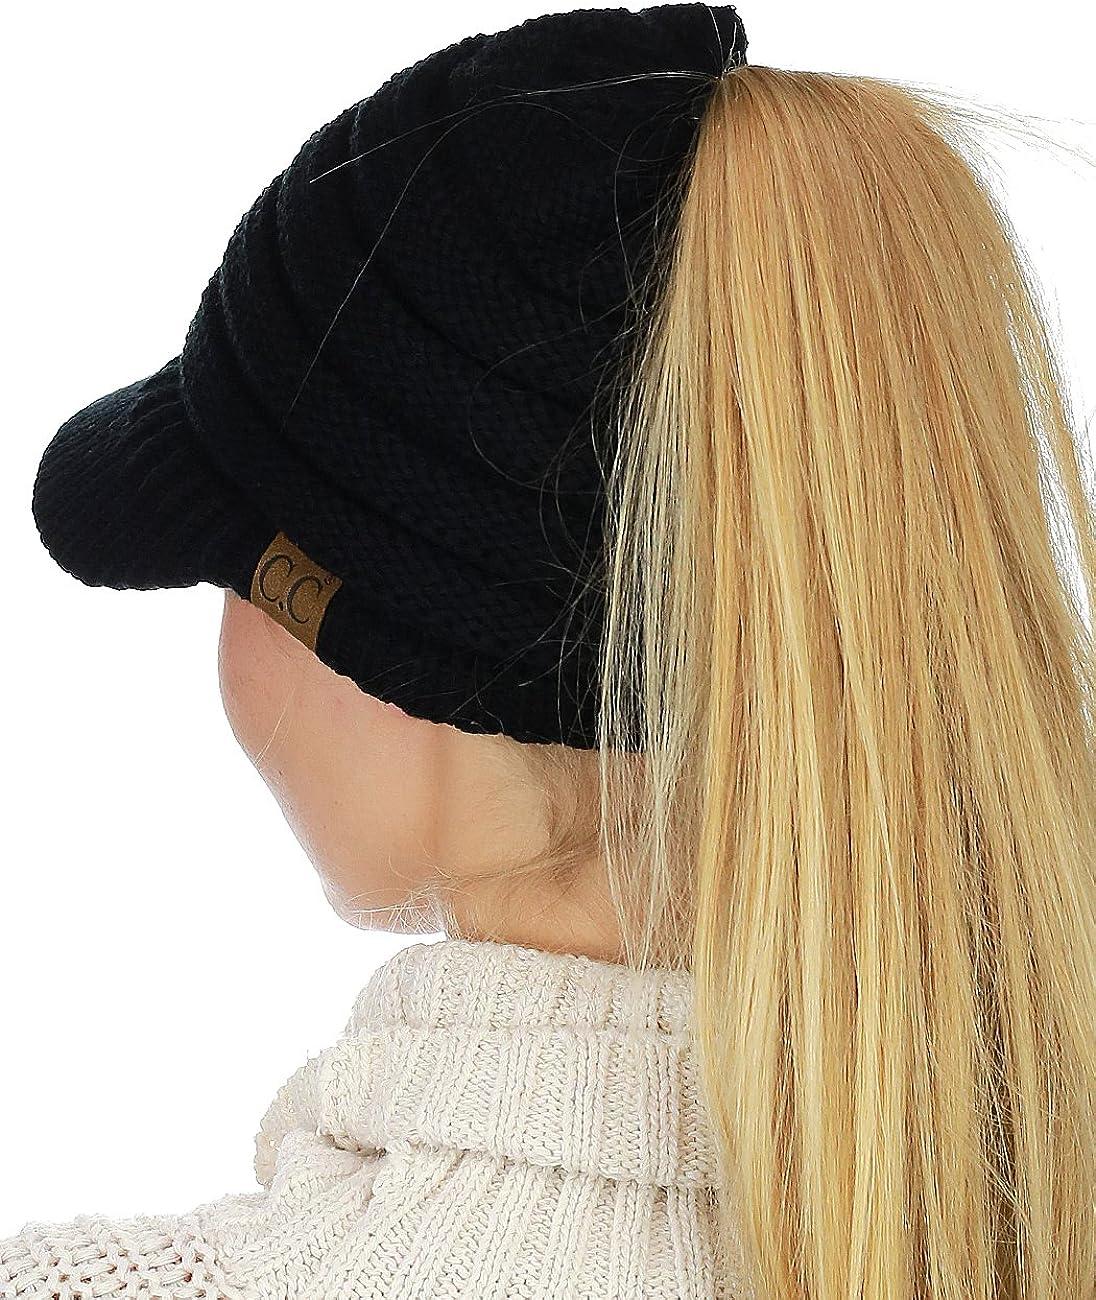 C.C BeanieTail Indefinitely Warm Knit Messy High Indefinitely Beanie Bun Ponytail Visor Ca